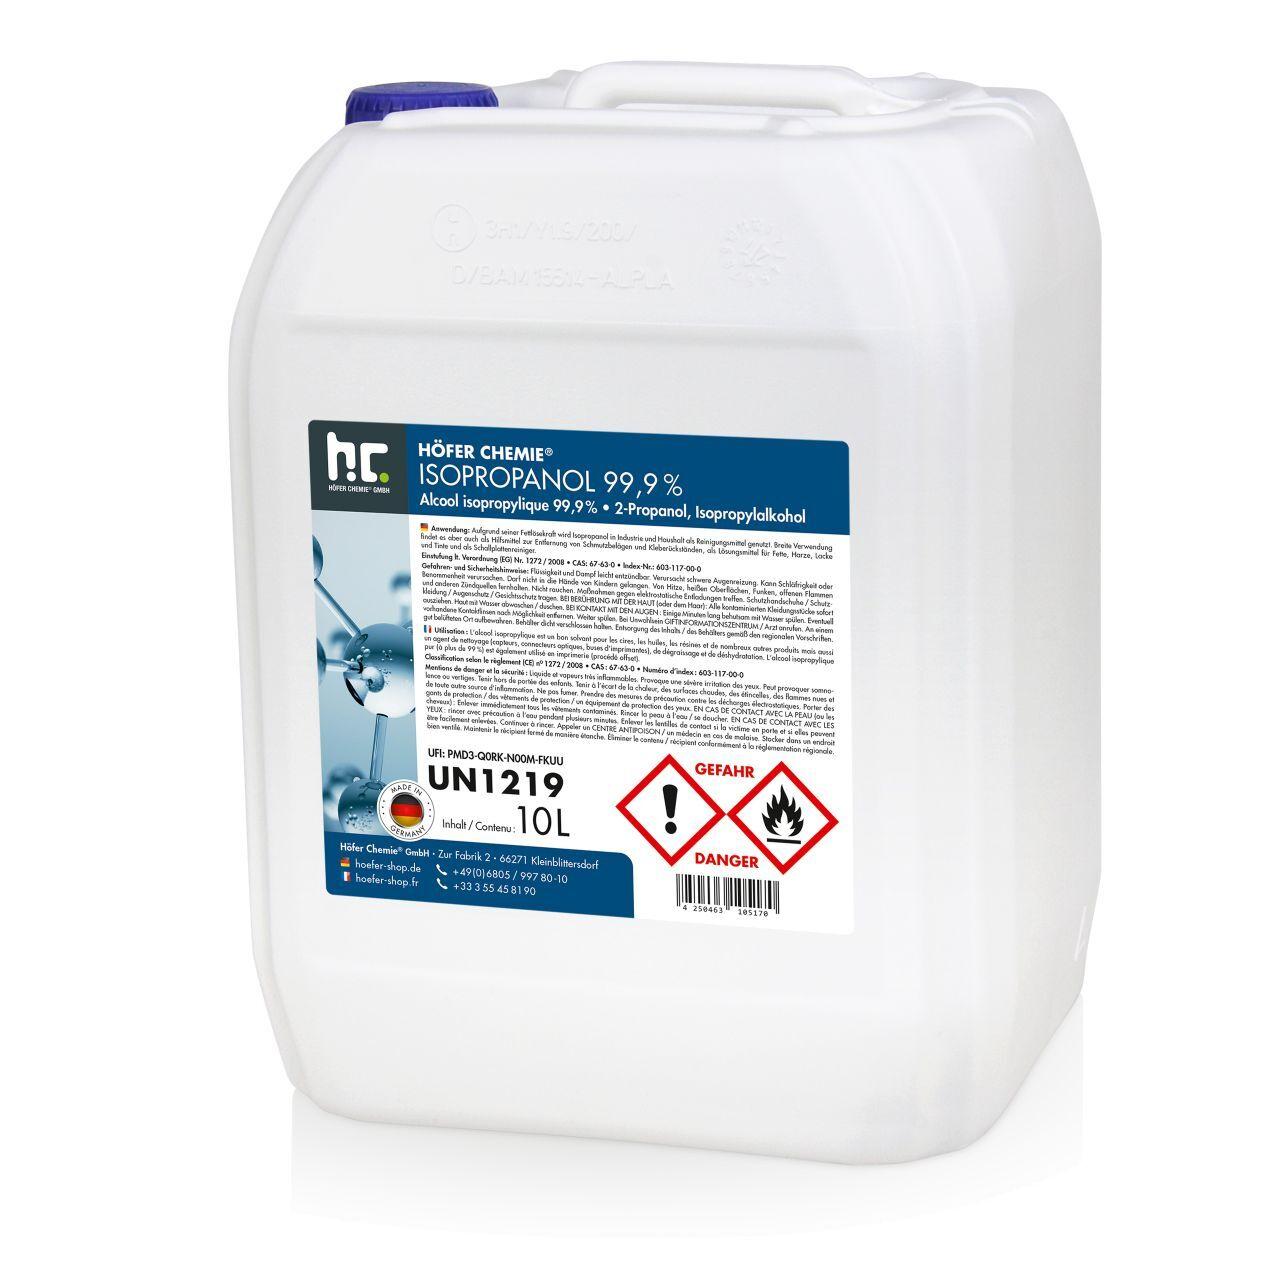 Höfer Chemie 60 l Alcool isopropylique 99,9 % (6 x 10 l)